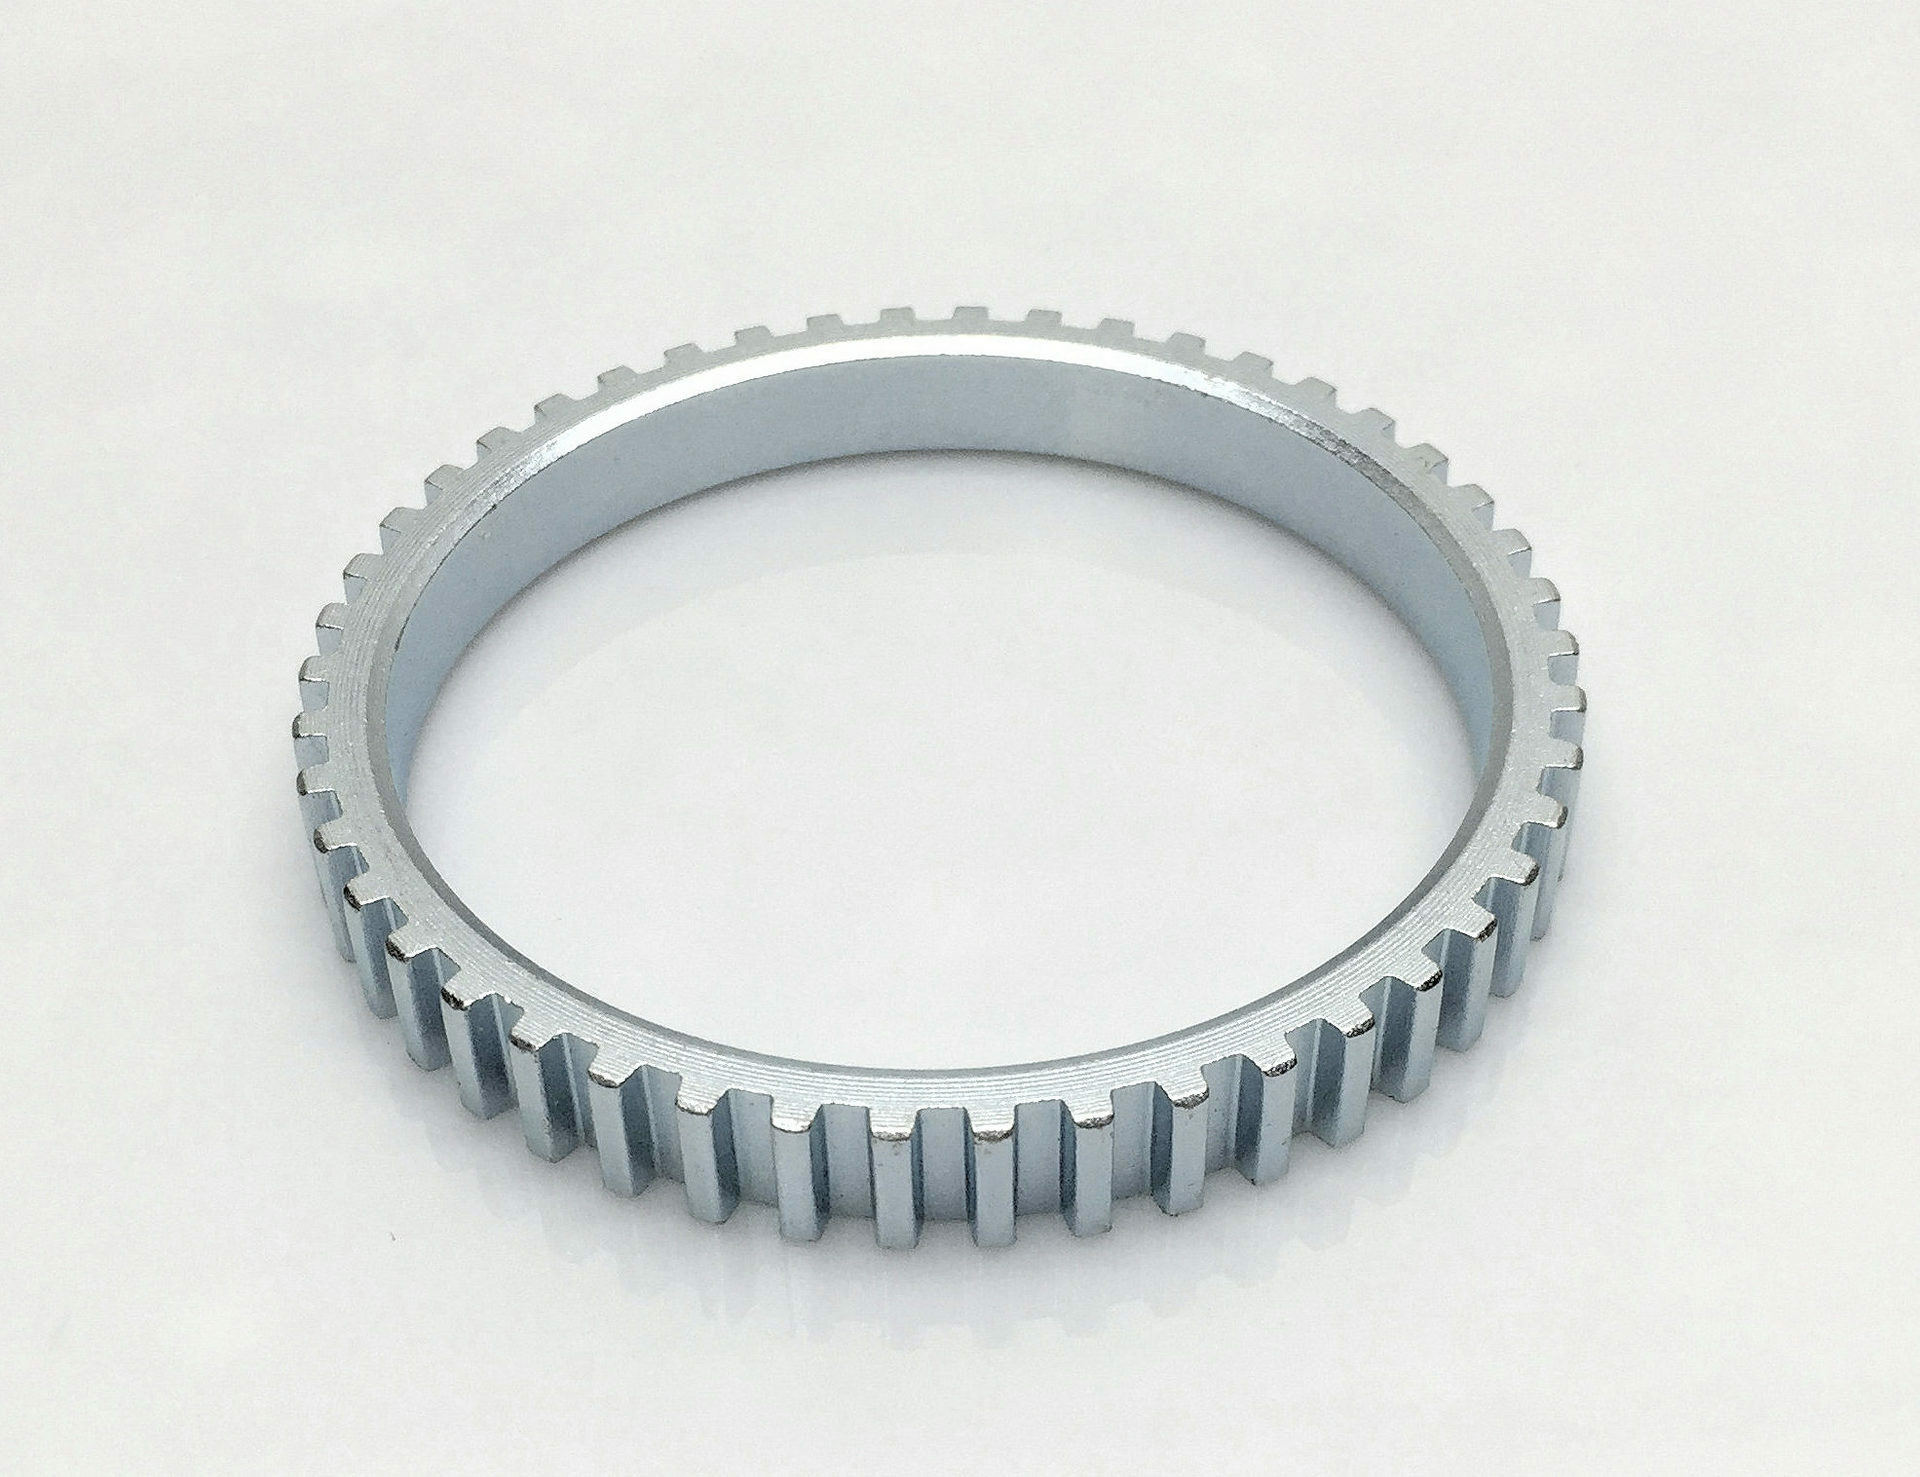 ABS Ring Sensorring Vorderachse Beidseitig CHRYSLER PT CRUISER